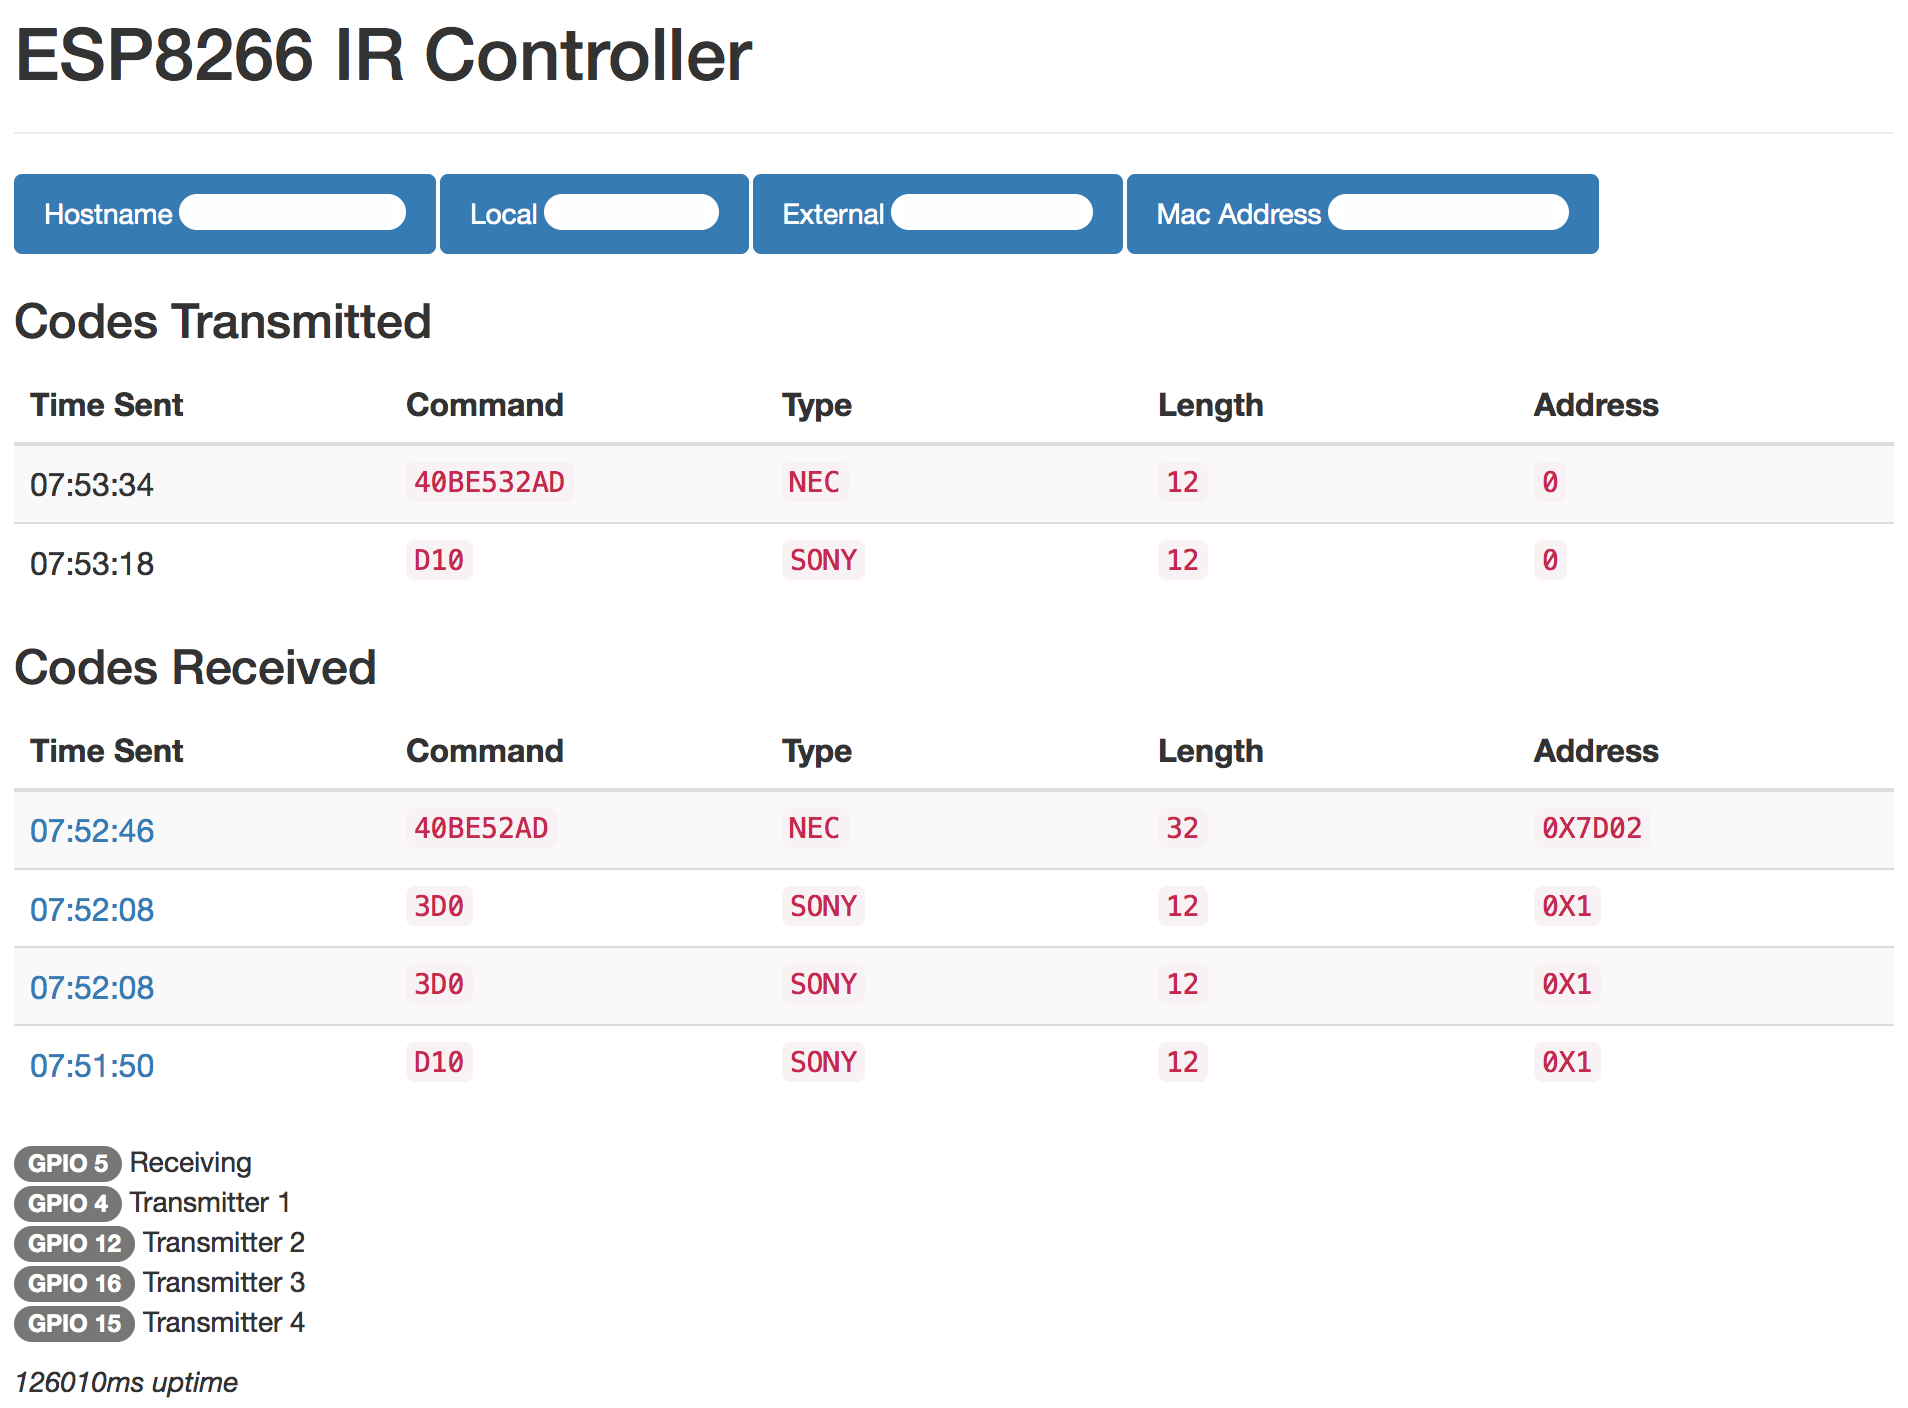 GitHub - mdhiggins/ESP8266-HTTP-IR-Blaster: ESP8266 Compatible IR